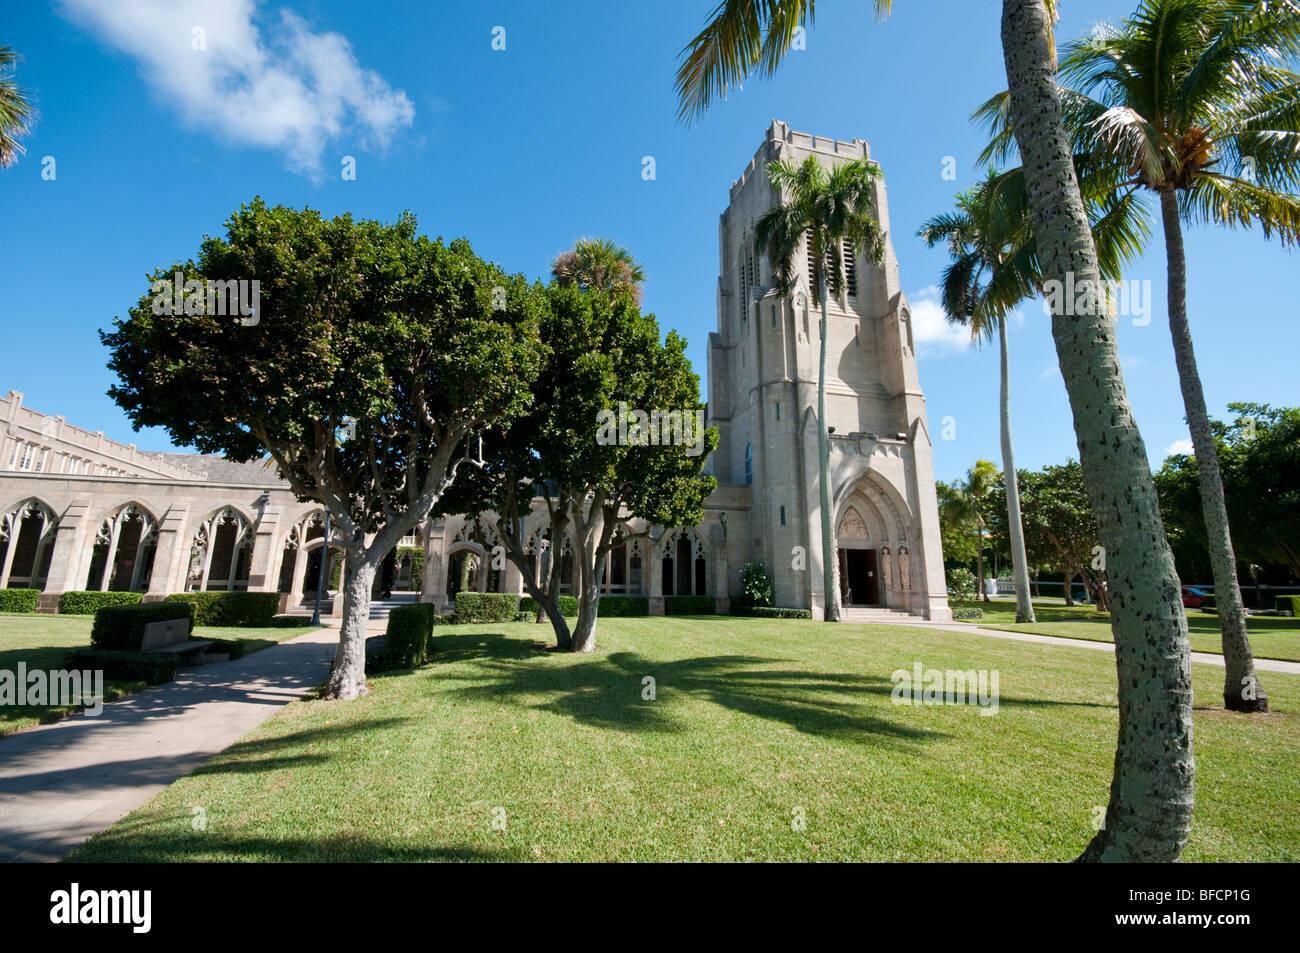 Amazing Church Palm Beach Gardens Gallery - Beautiful Garden - dlix.us